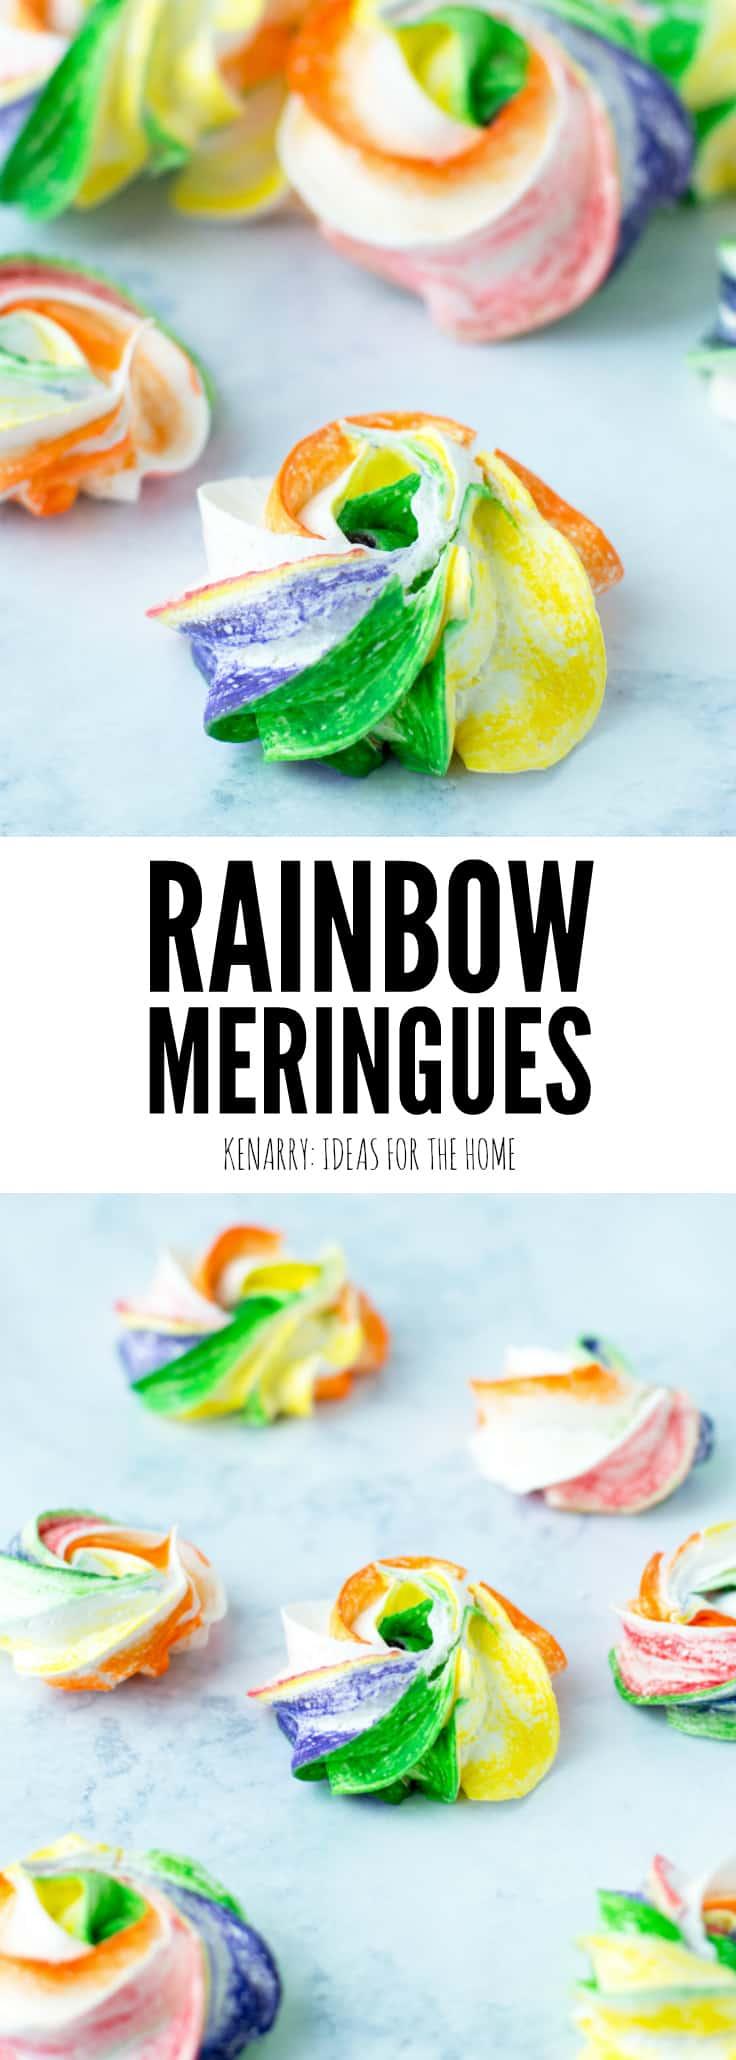 rainbow meringue cookies on a marble surface